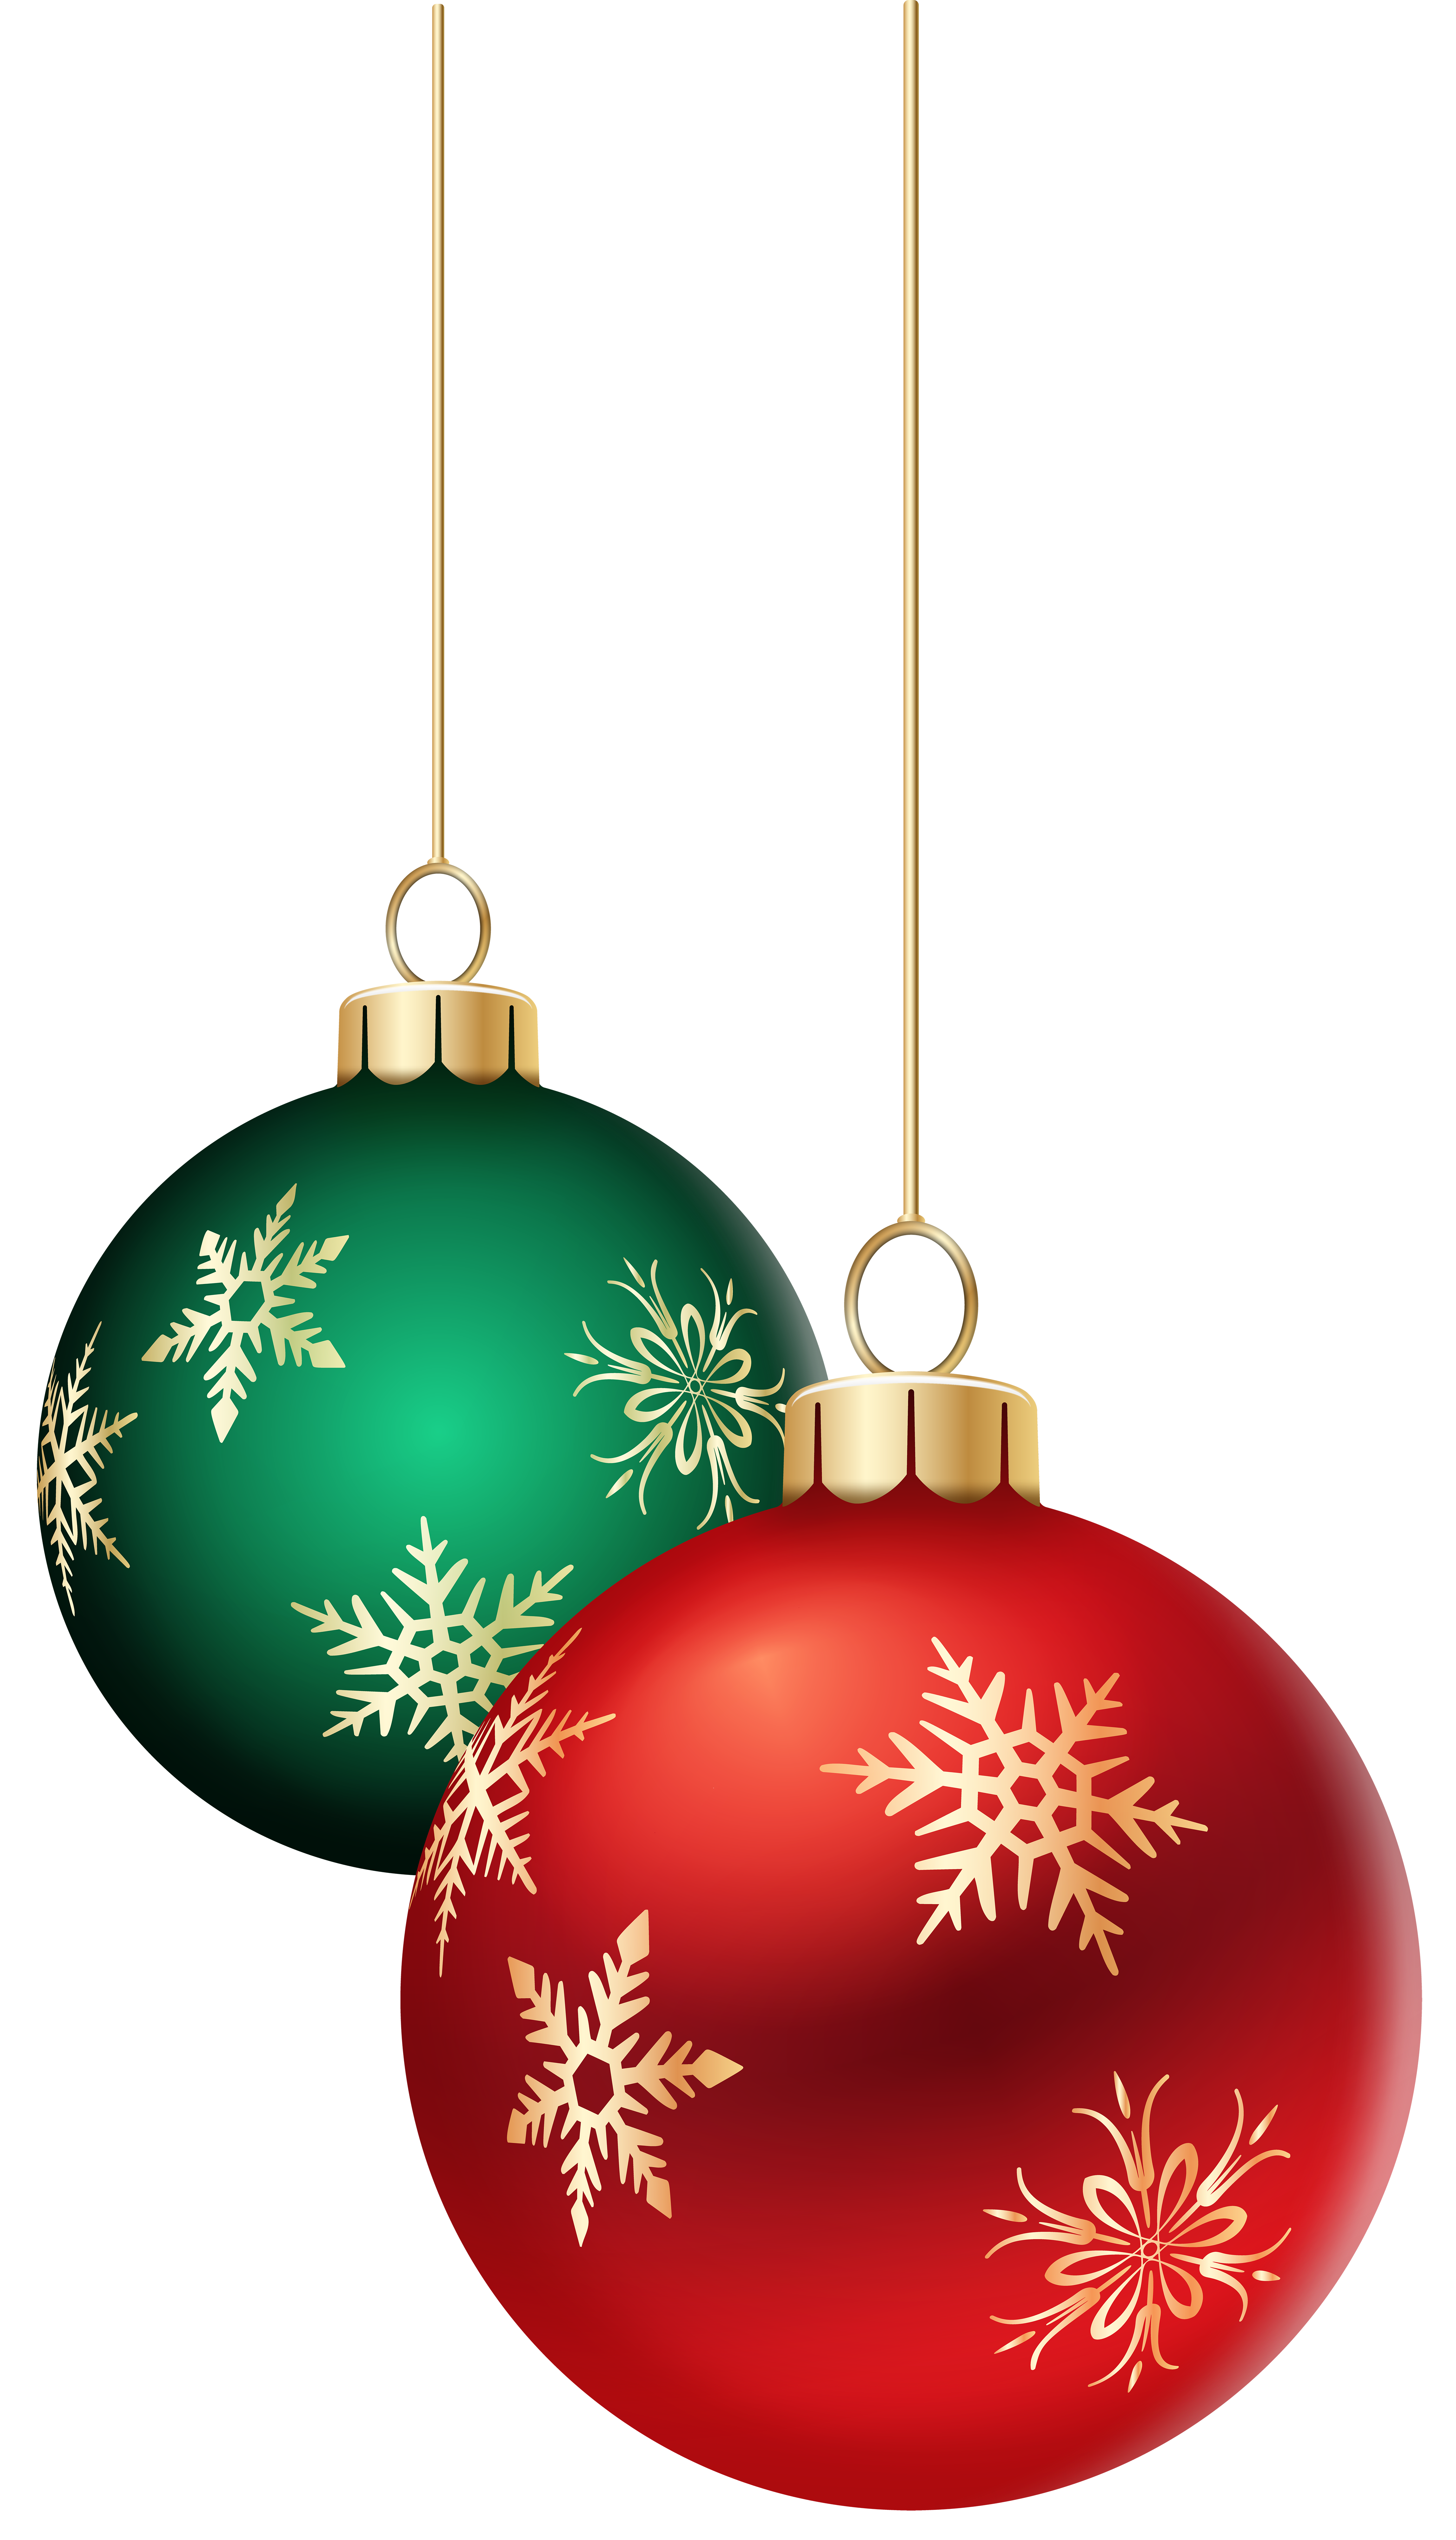 Christmas Clipart Transparent.Christmas Clipart Transparent Free Download Best Christmas